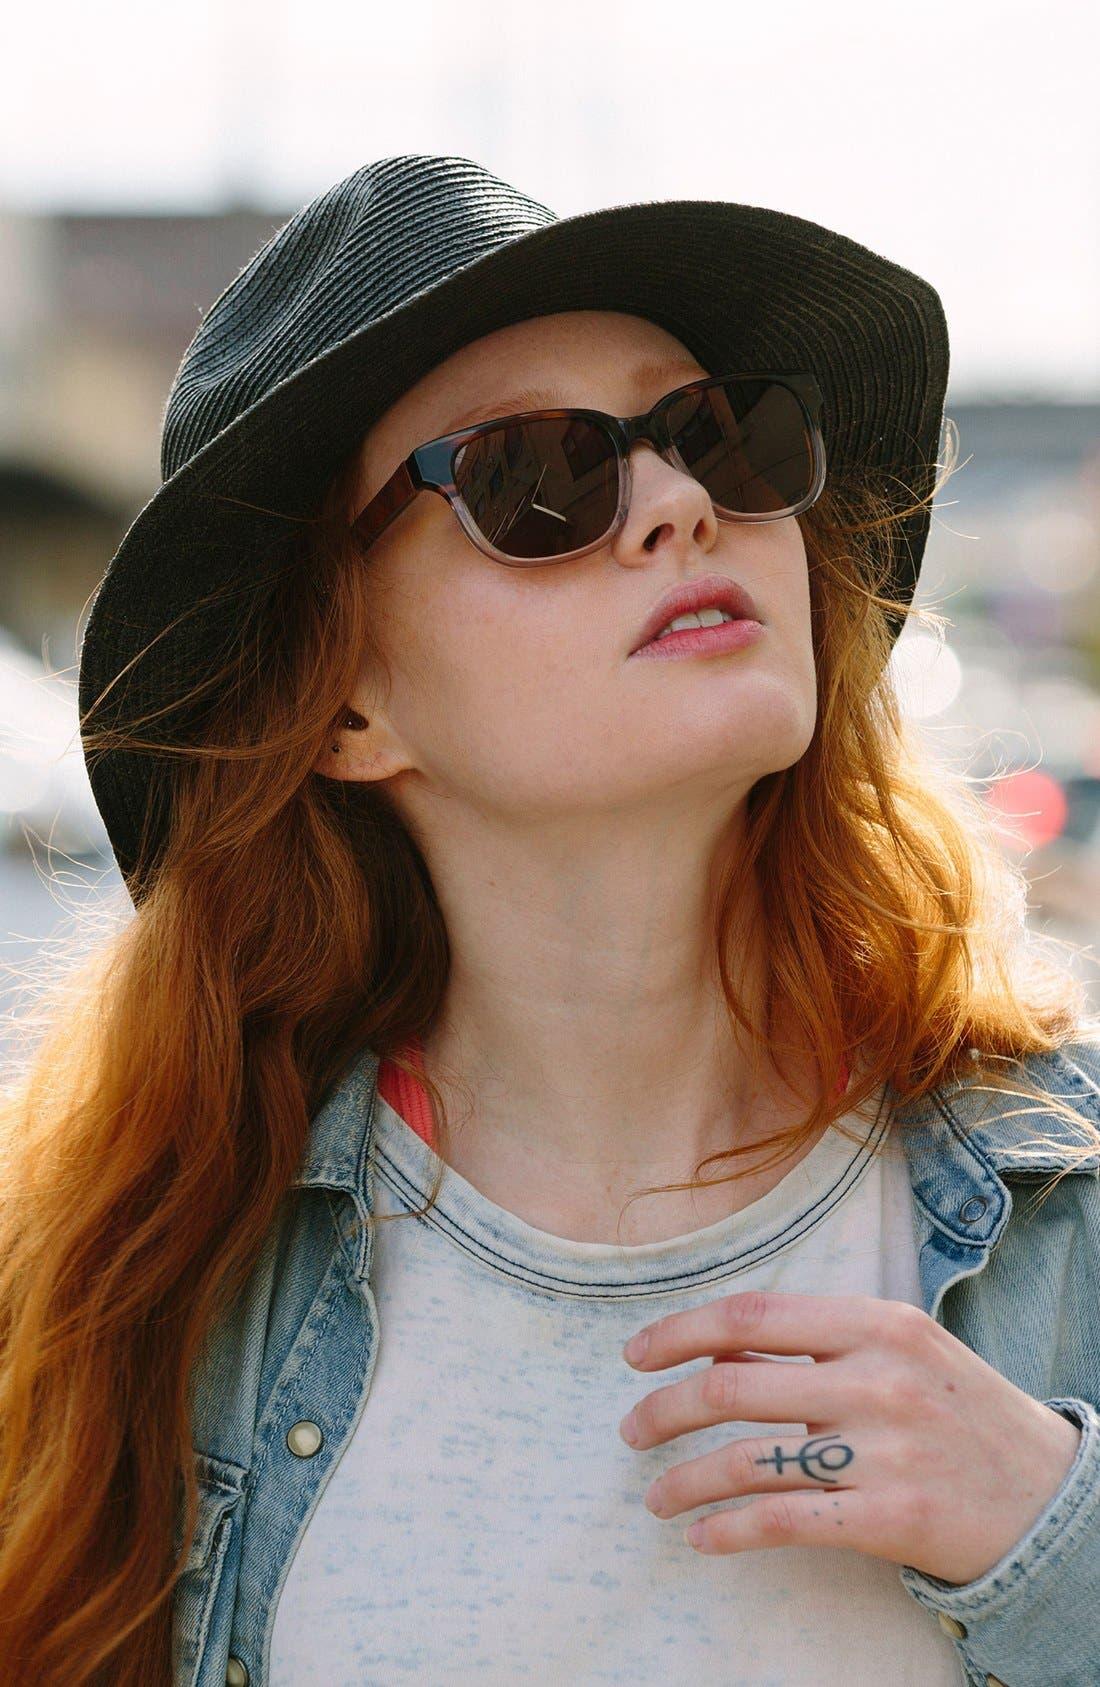 'Prescott' 52mm Polarized Acetate & Wood Sunglasses,                             Alternate thumbnail 2, color,                             222